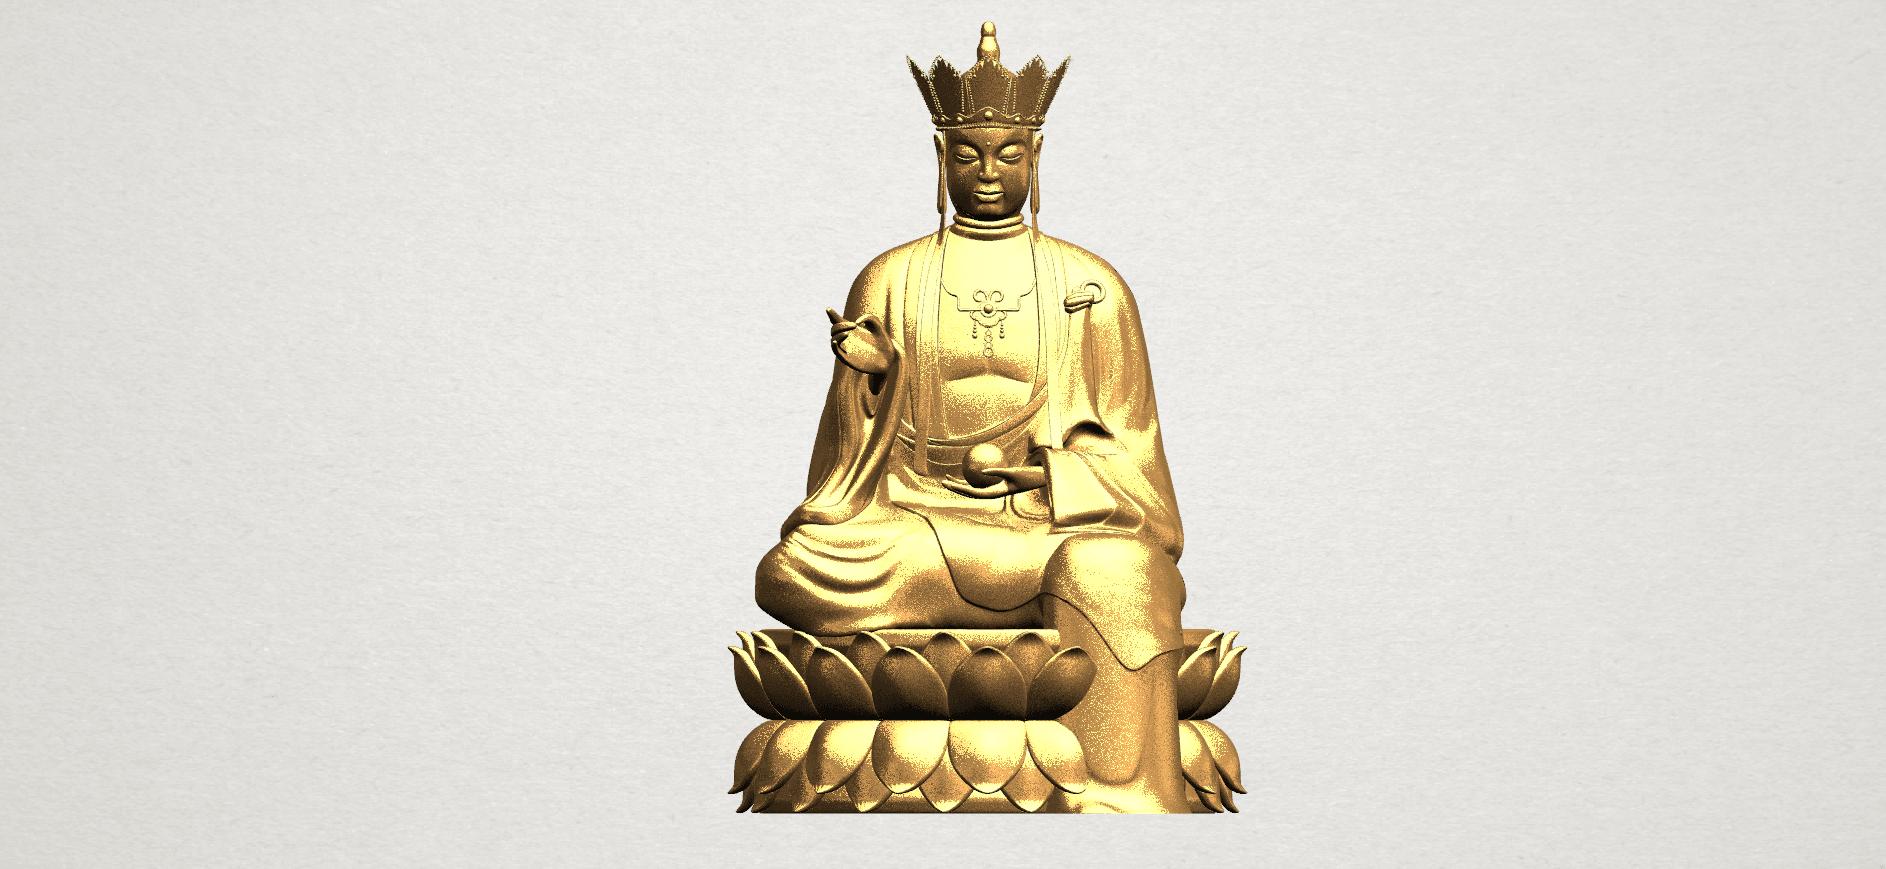 Tang Monk Xuan Zang A01.png Télécharger fichier STL gratuit Tang Monk Xuan Zang Zang • Plan à imprimer en 3D, GeorgesNikkei